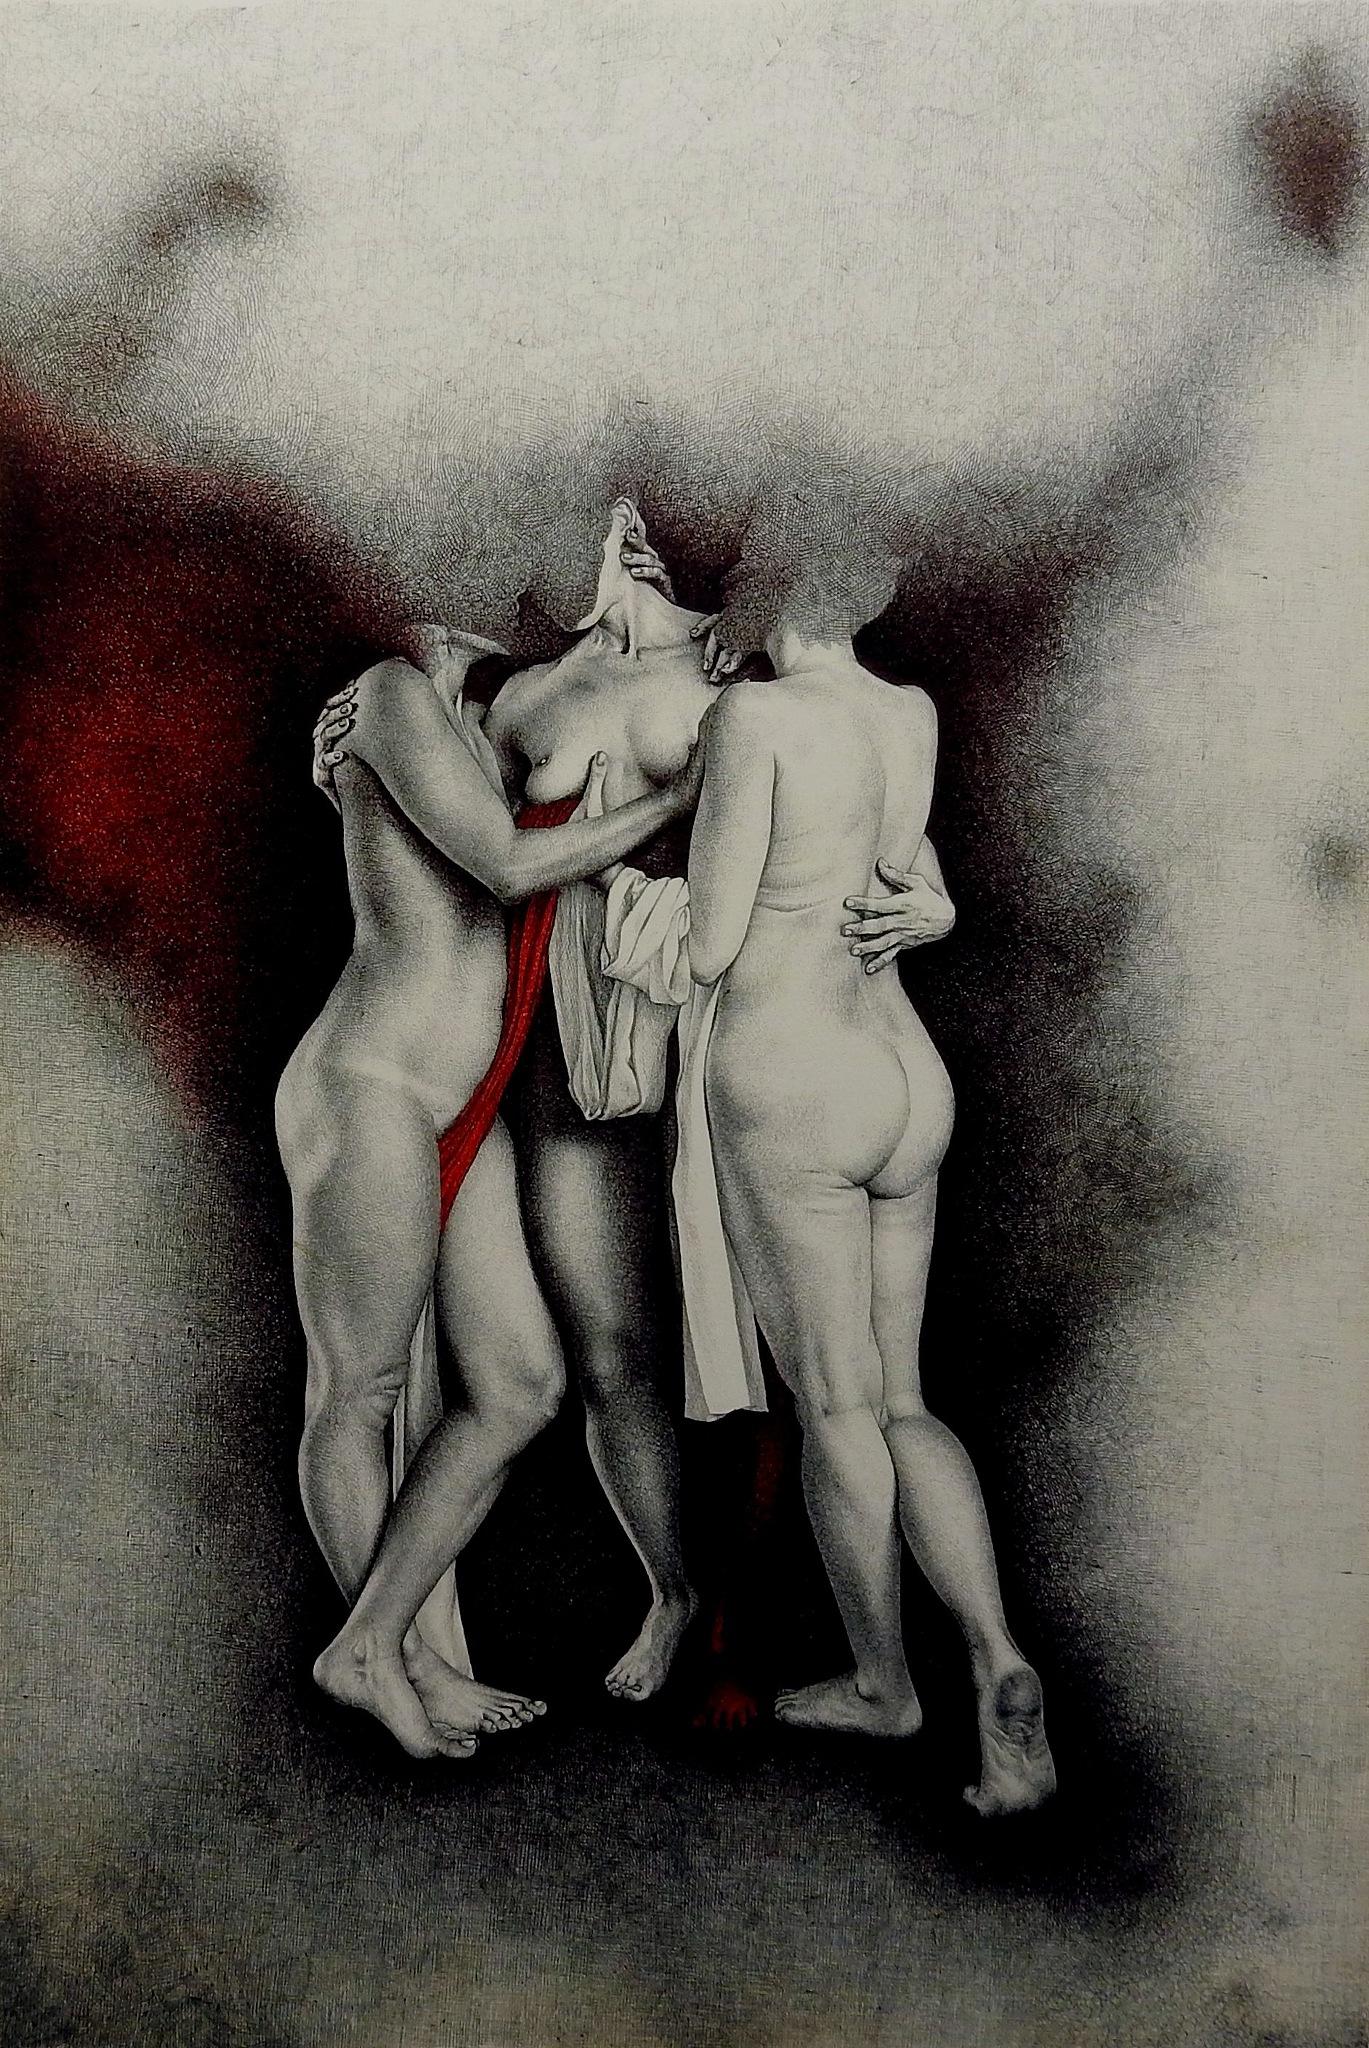 P.A.N. Napoli Adele Ceraudo -  Le Grazie by Arnaldo De Lisio